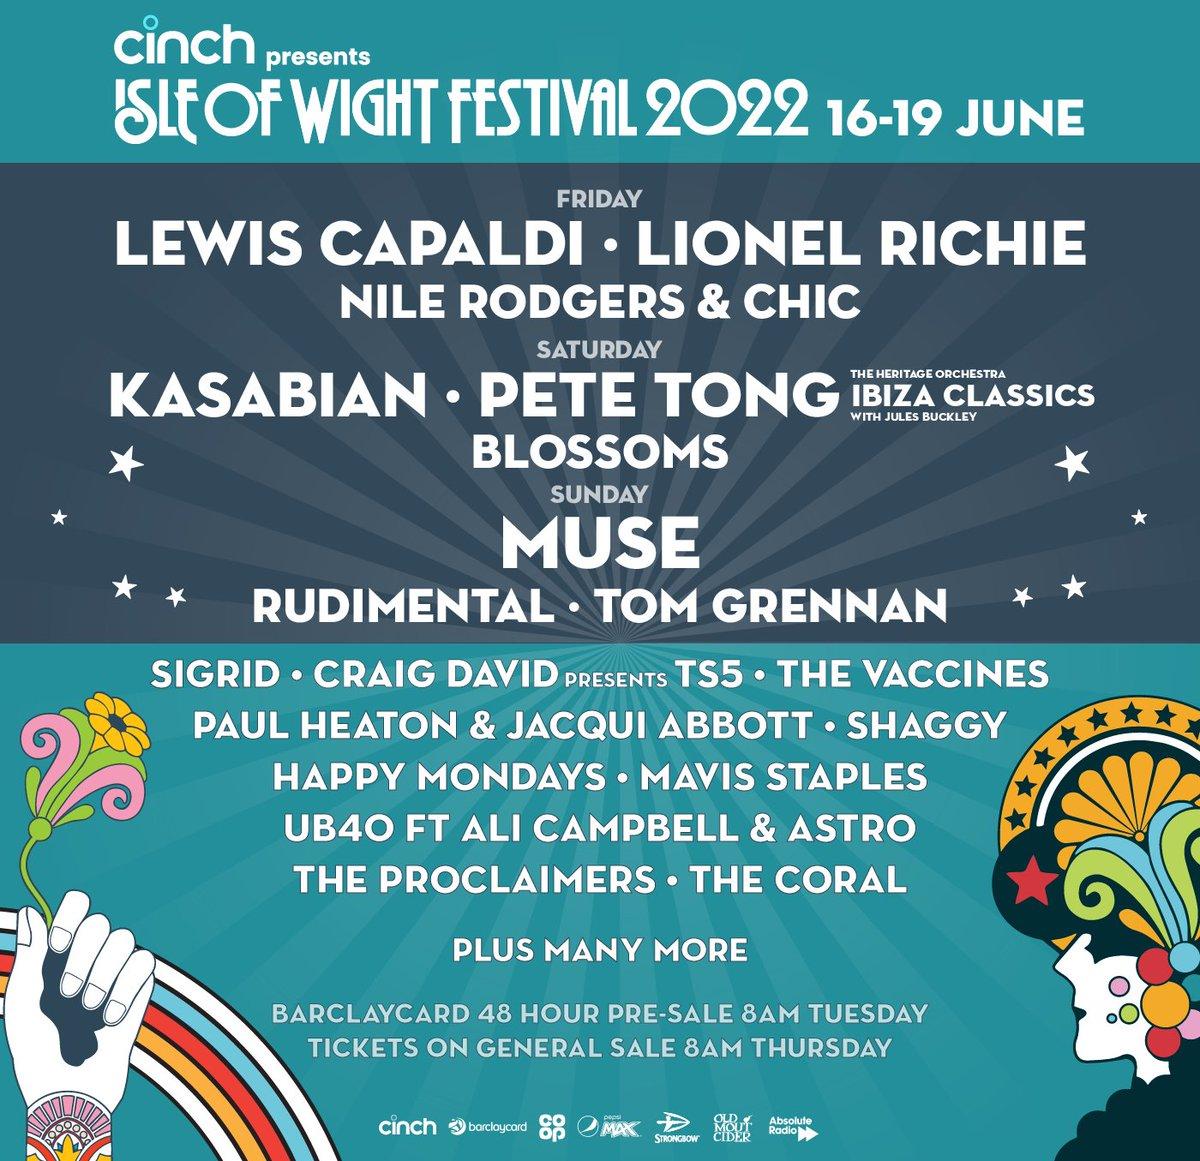 Just announced! We're bringing @IbizaClassics_ to @IsleOfWightFest 2022! Catch us headlining the Saturday!! @julesbuckley @HeritageOrc #IOW2022 #cinchxIOW   Tickets: isleofwightfestival.com/tickets